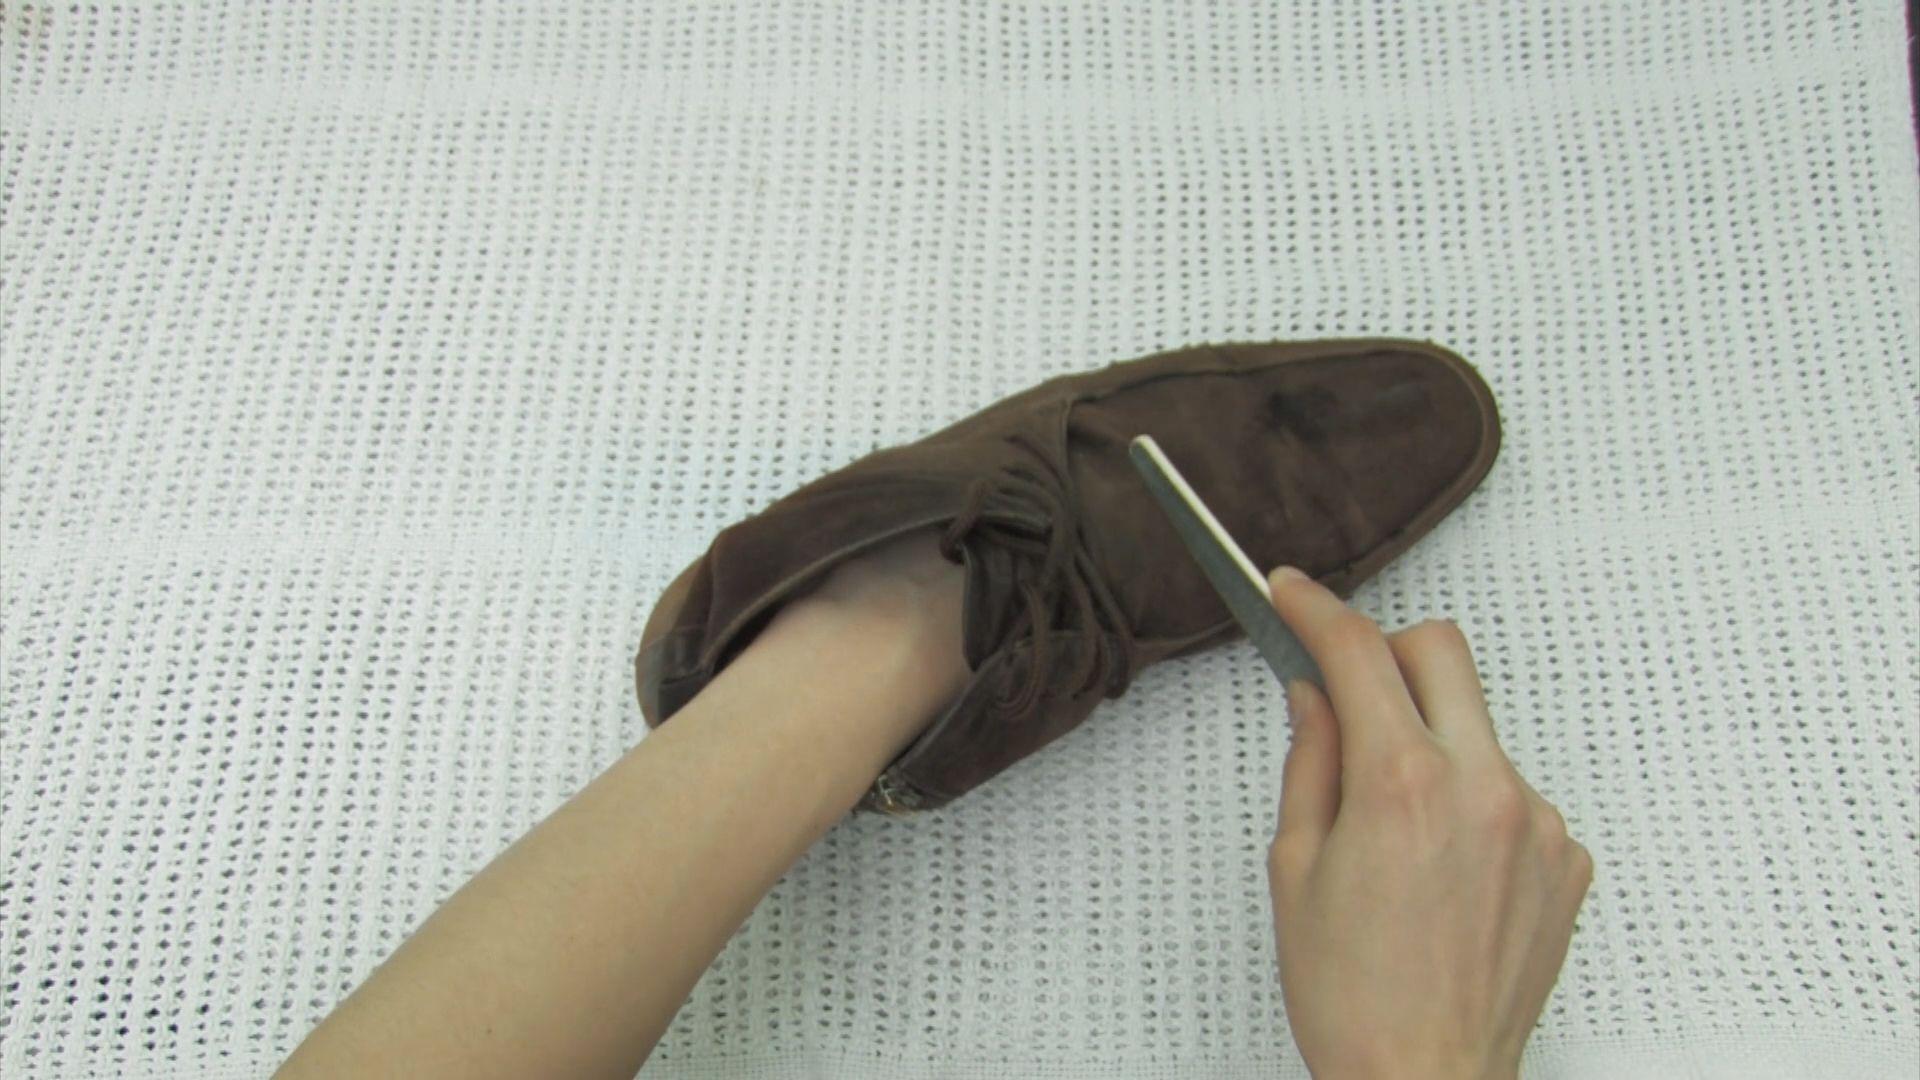 Nettoyer des chaussures en daim chaussures en daim bleu - Nettoyer des chaussures en daim ...